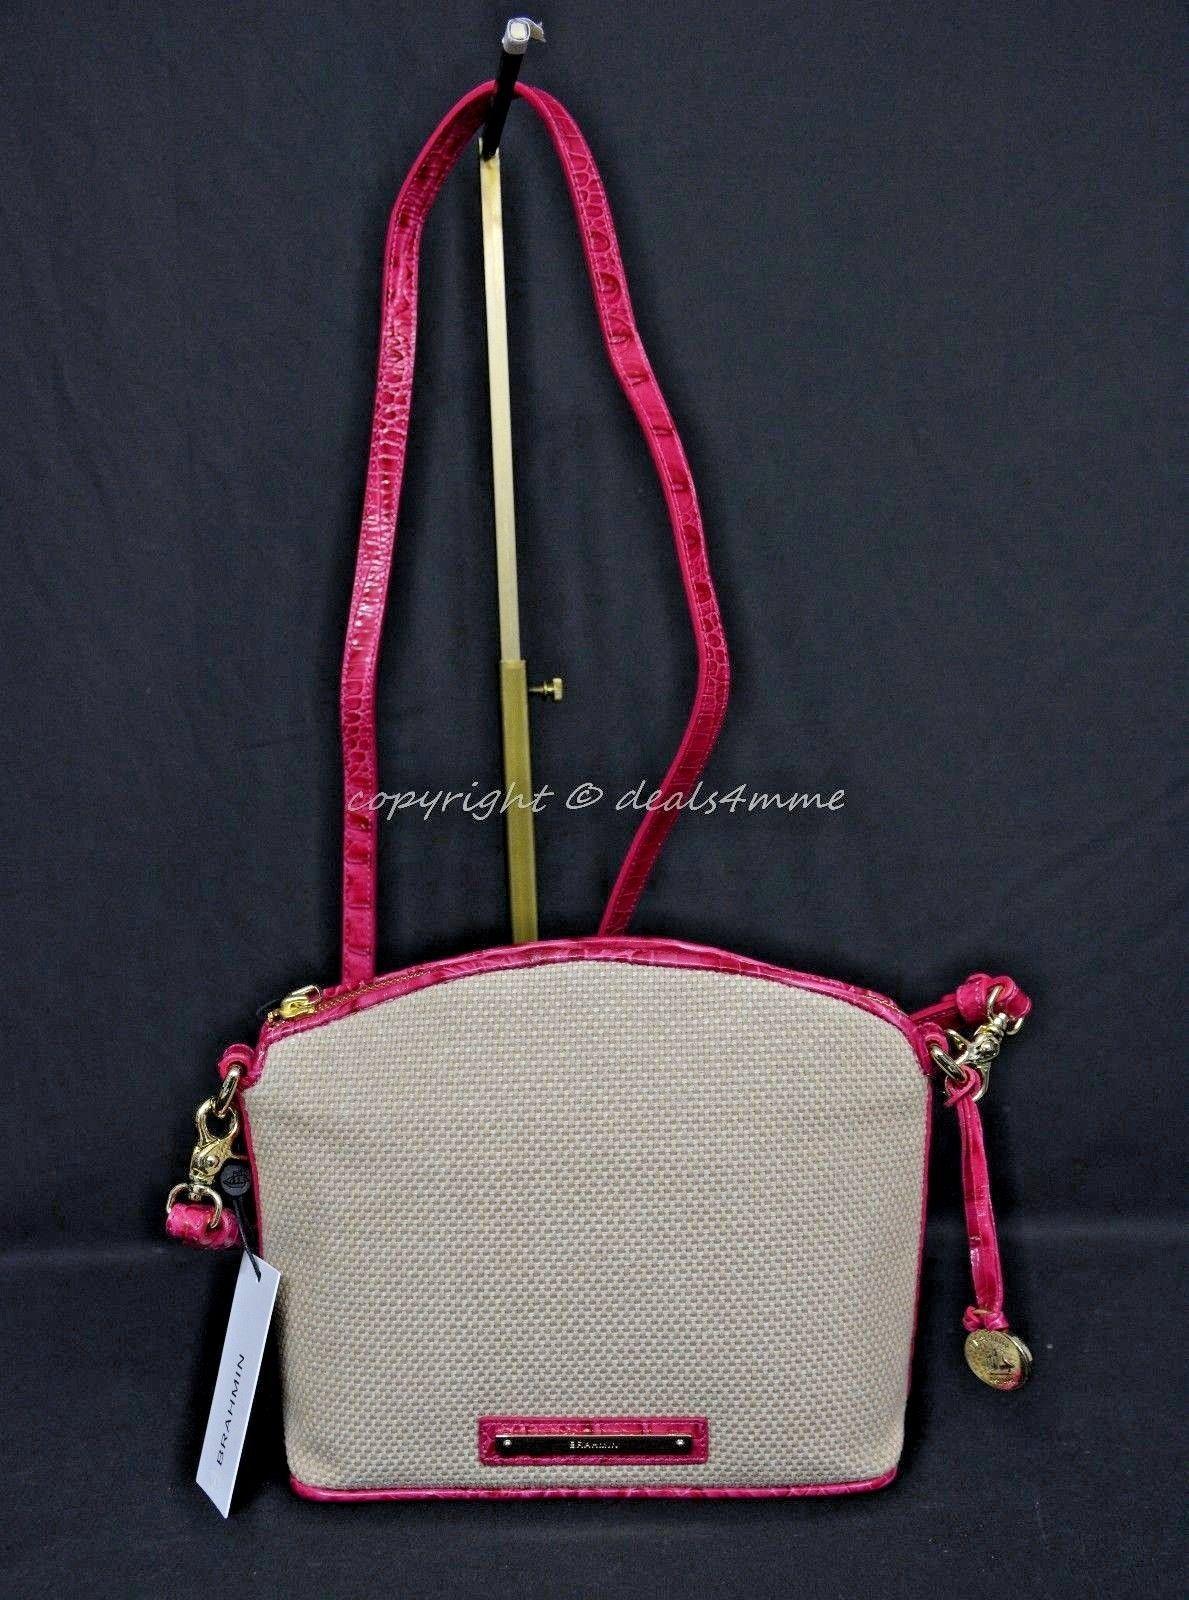 NWT Brahmin Mini Duxbury Shoulder Bag in Punch Harbor, Pink Leather/Beige Fabric image 2